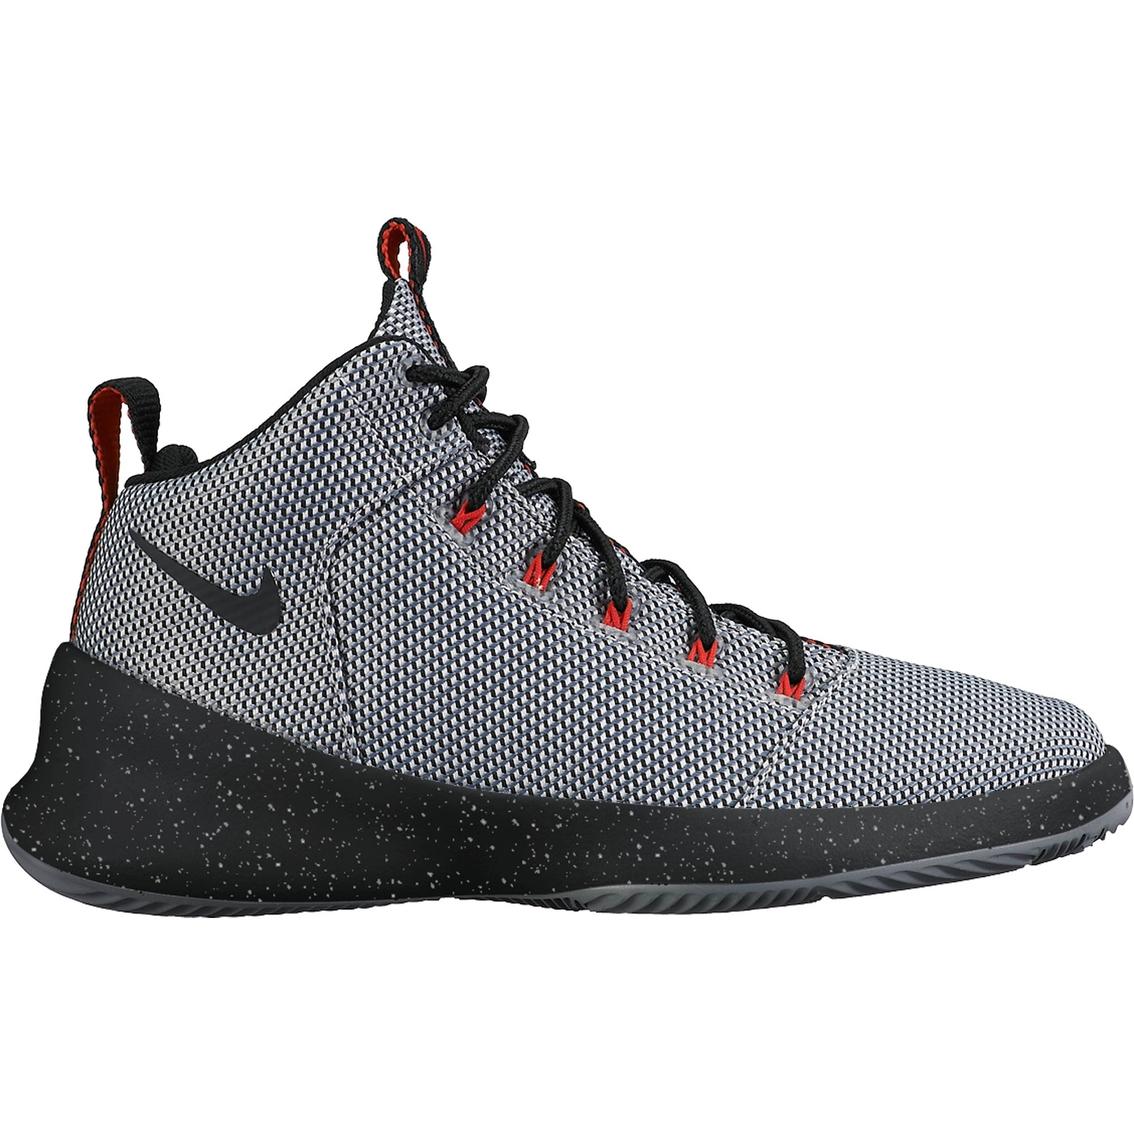 nike basketball shoes price list, Nike